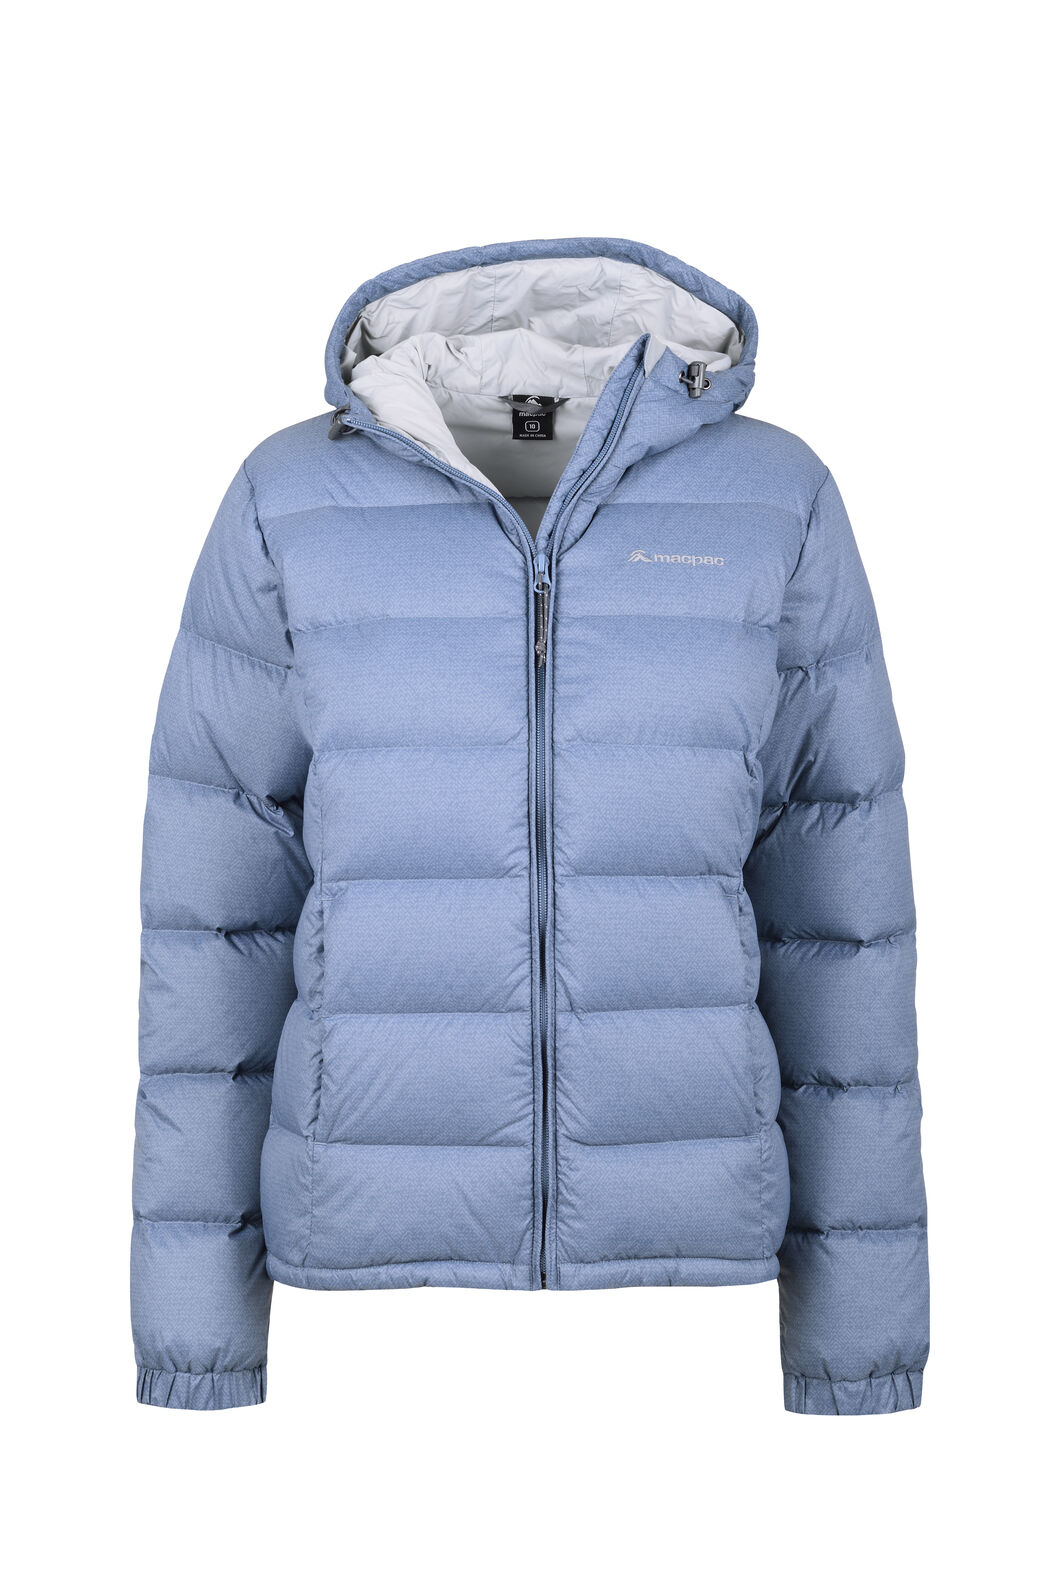 Macpac Halo Hooded Down Jacket - Women's, China Blue Print, hi-res